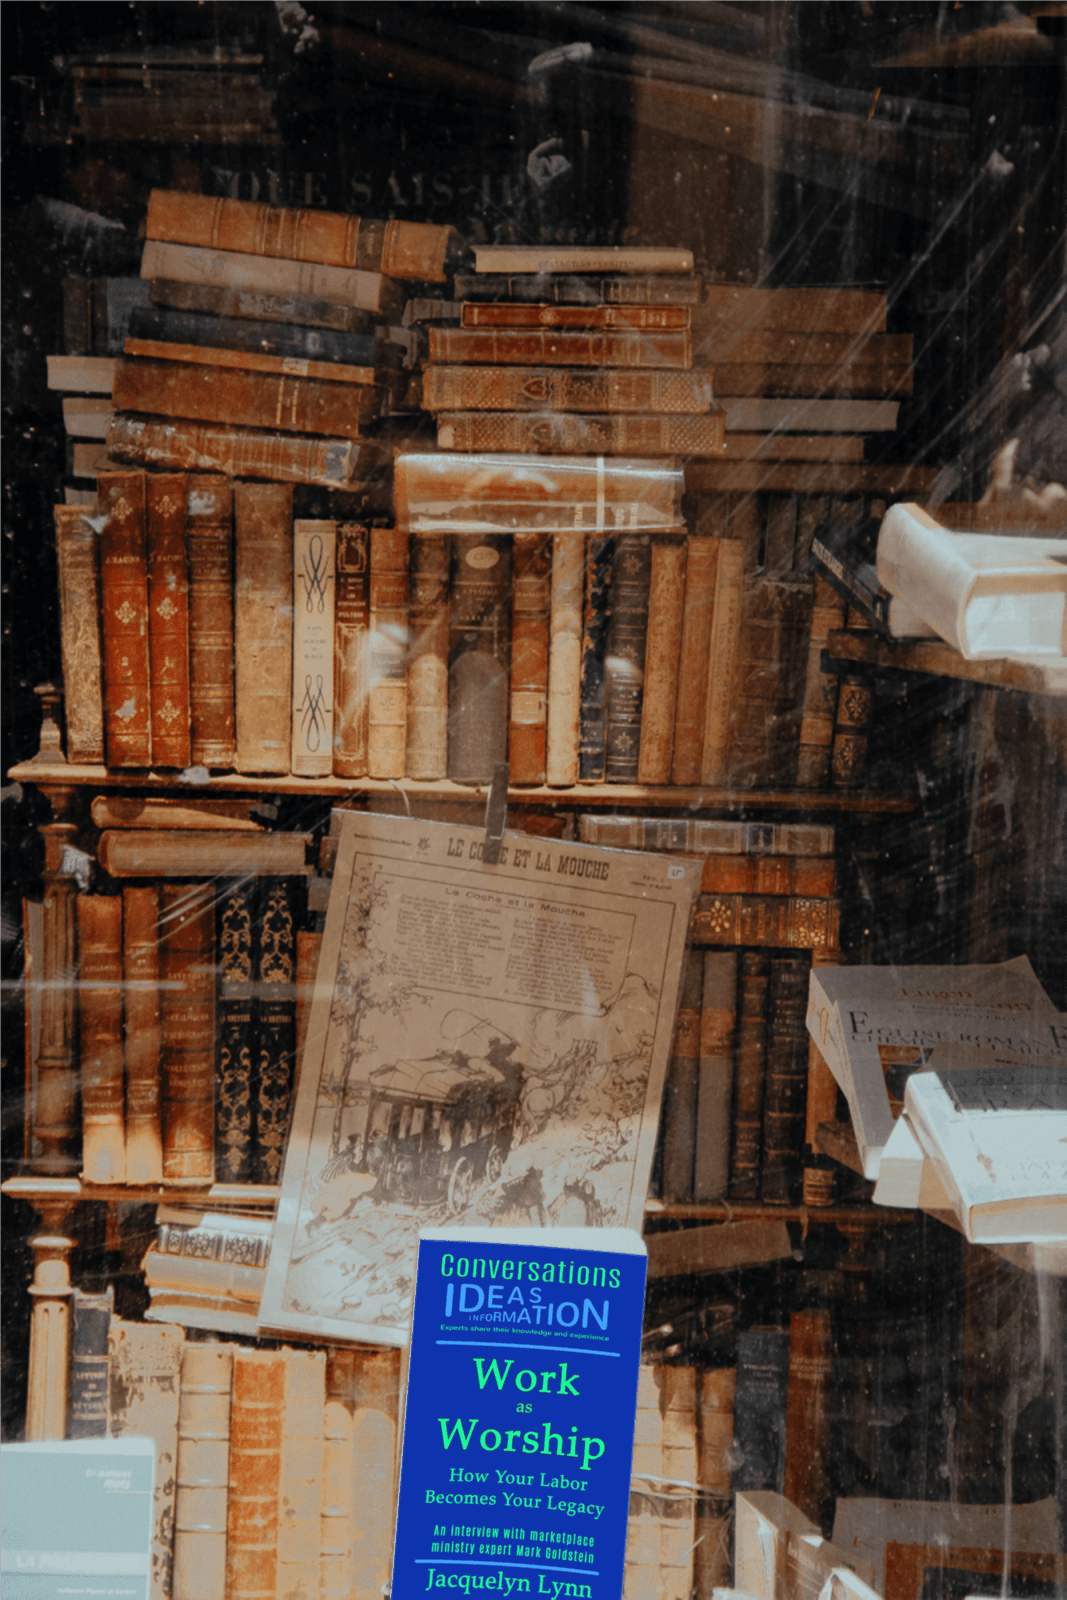 Bookstore window - Work as Worship - Jacquelyn Lynn